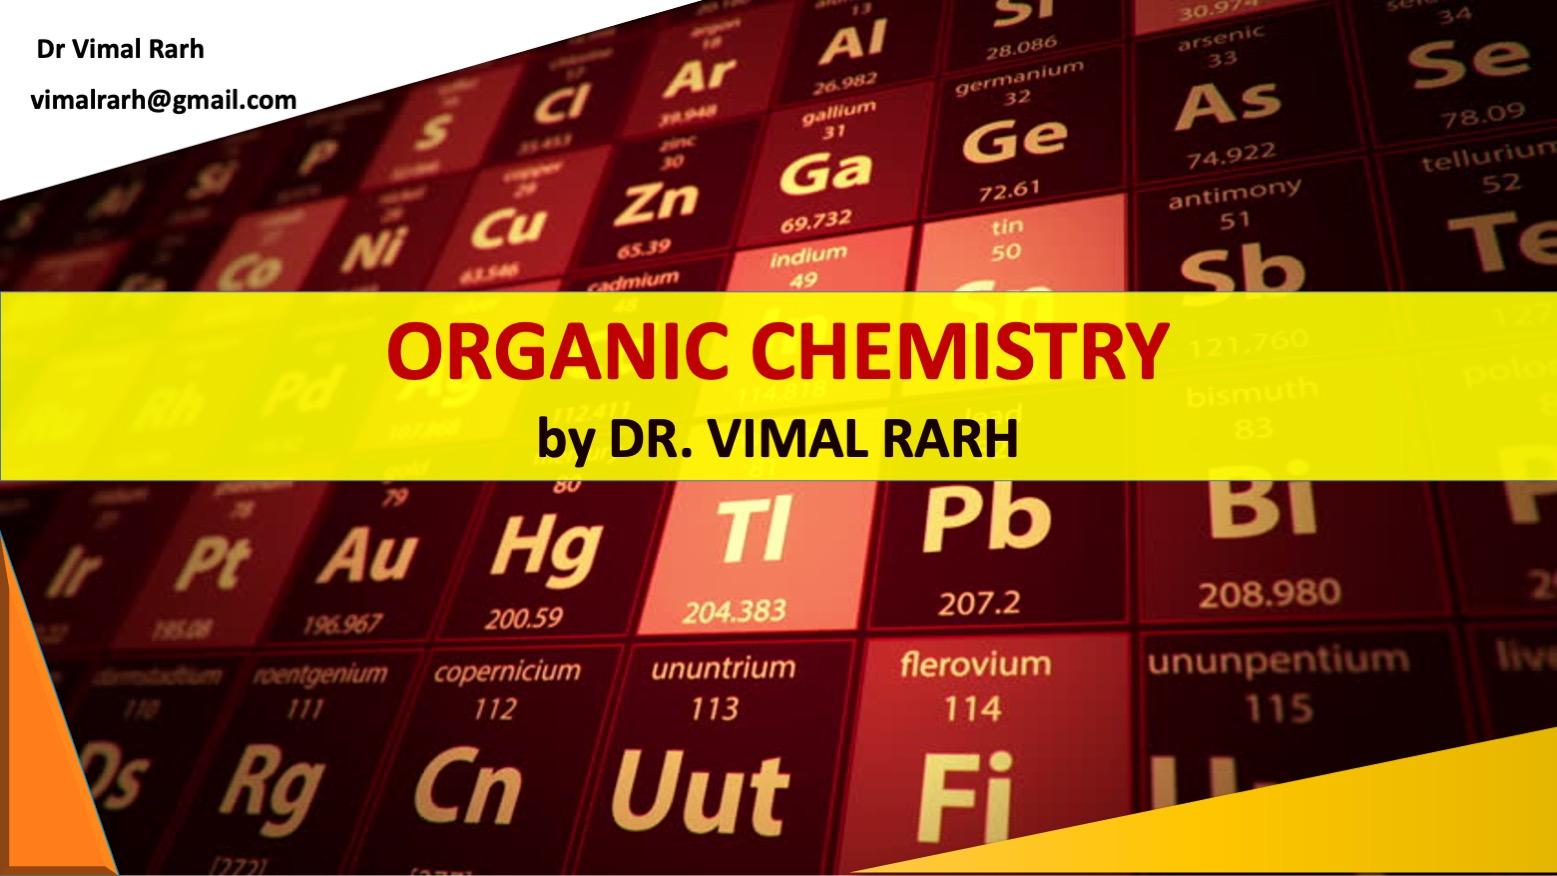 Course Image MeCPro1003: Dr Vimal Rarh: Organic Chemistry - Sem-I